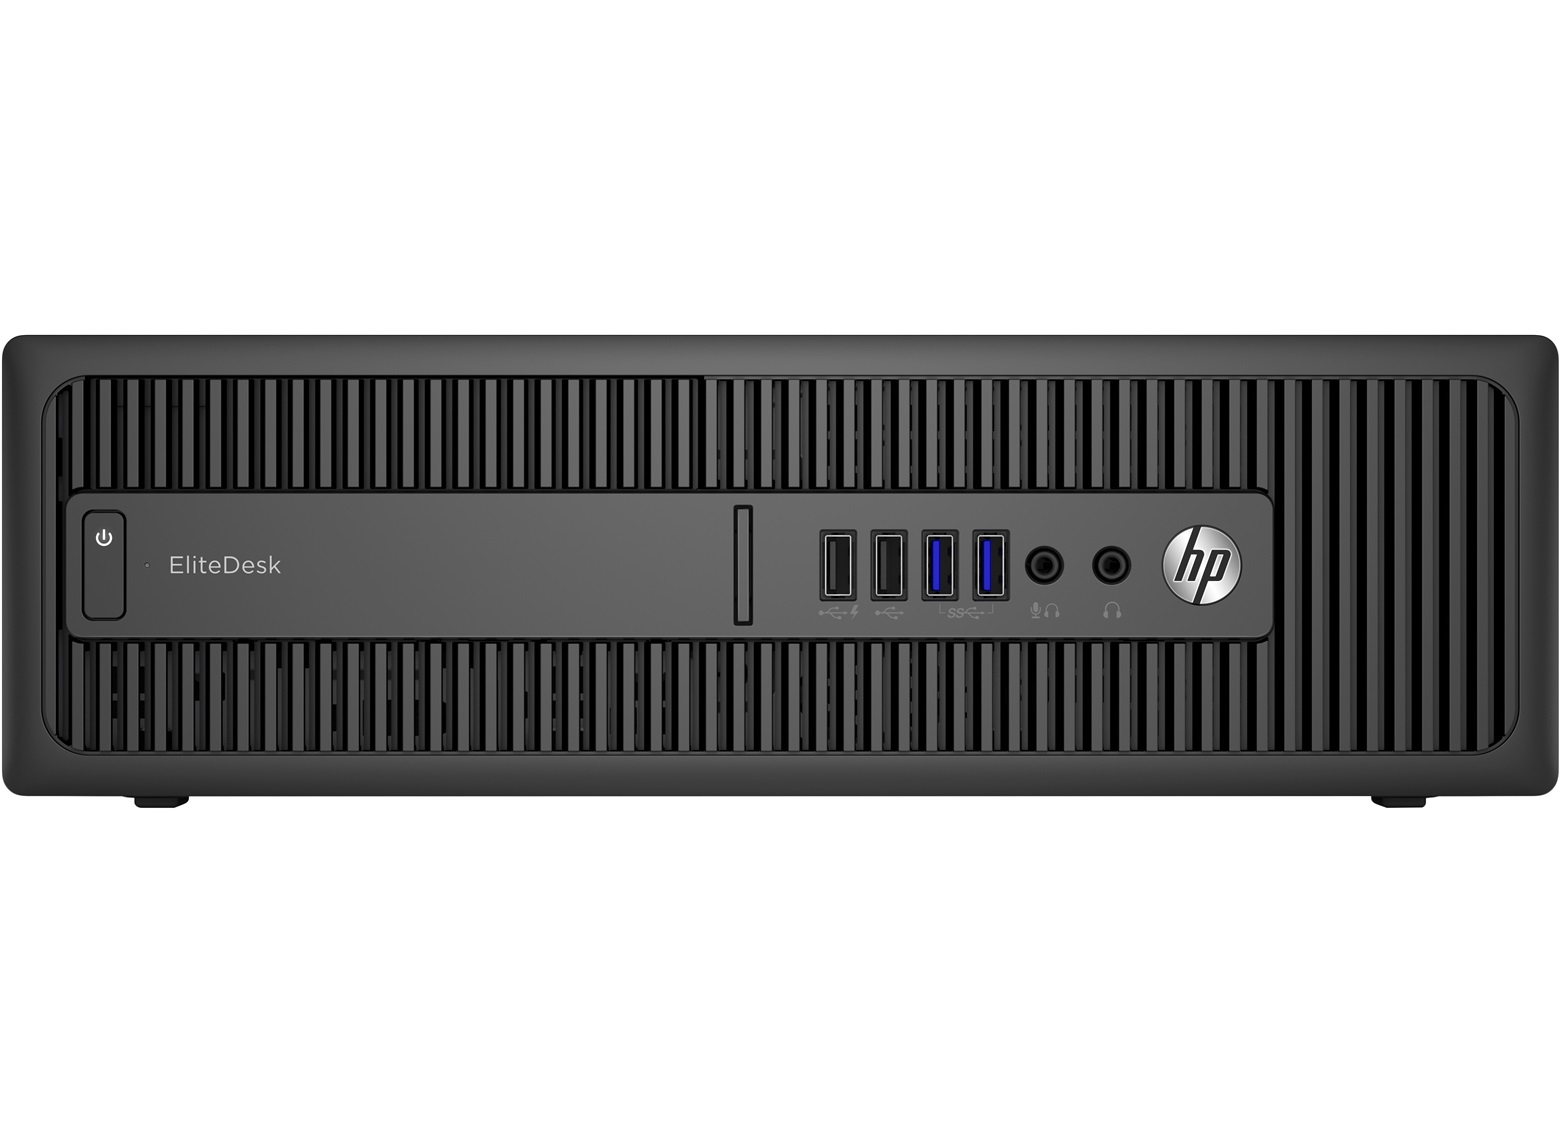 HP EliteDesk 800 G2 SFF 3.2GHz i5-6500 SFF Black